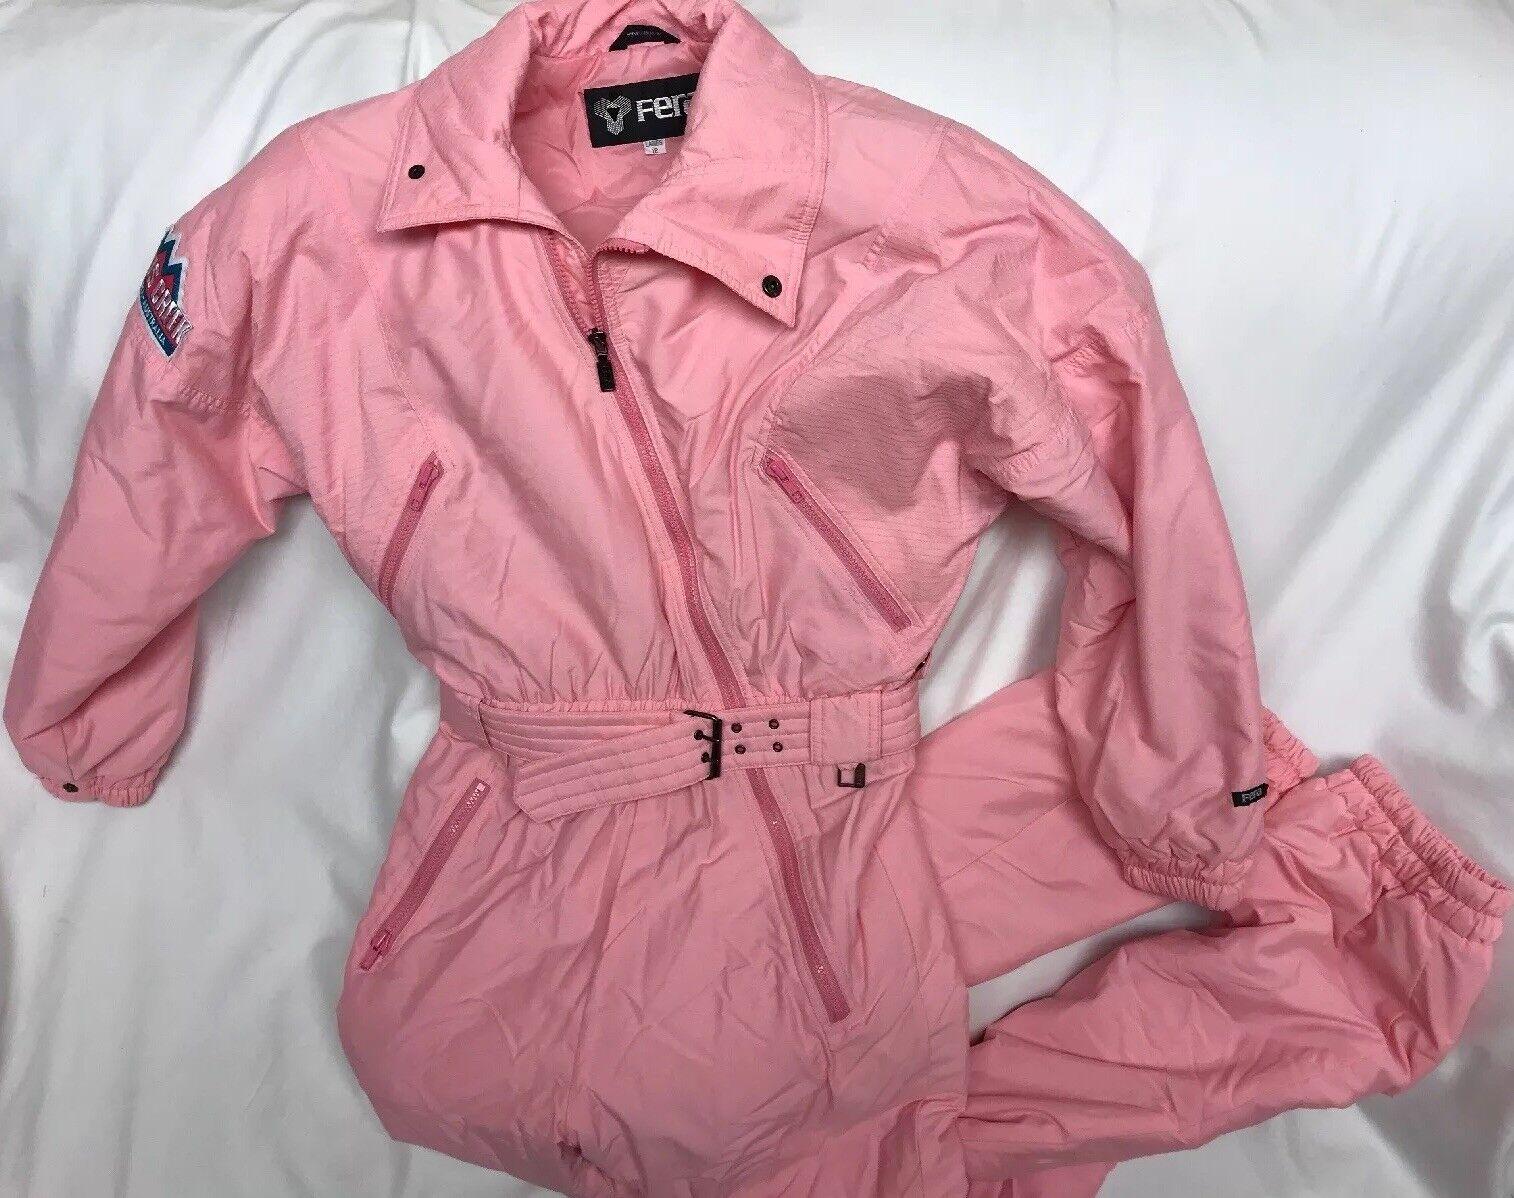 Vtg 80s  90s Pink FERA Ladies Size 12 One piece SKI SUIT Snowsuit Snow Bunny  fast delivery